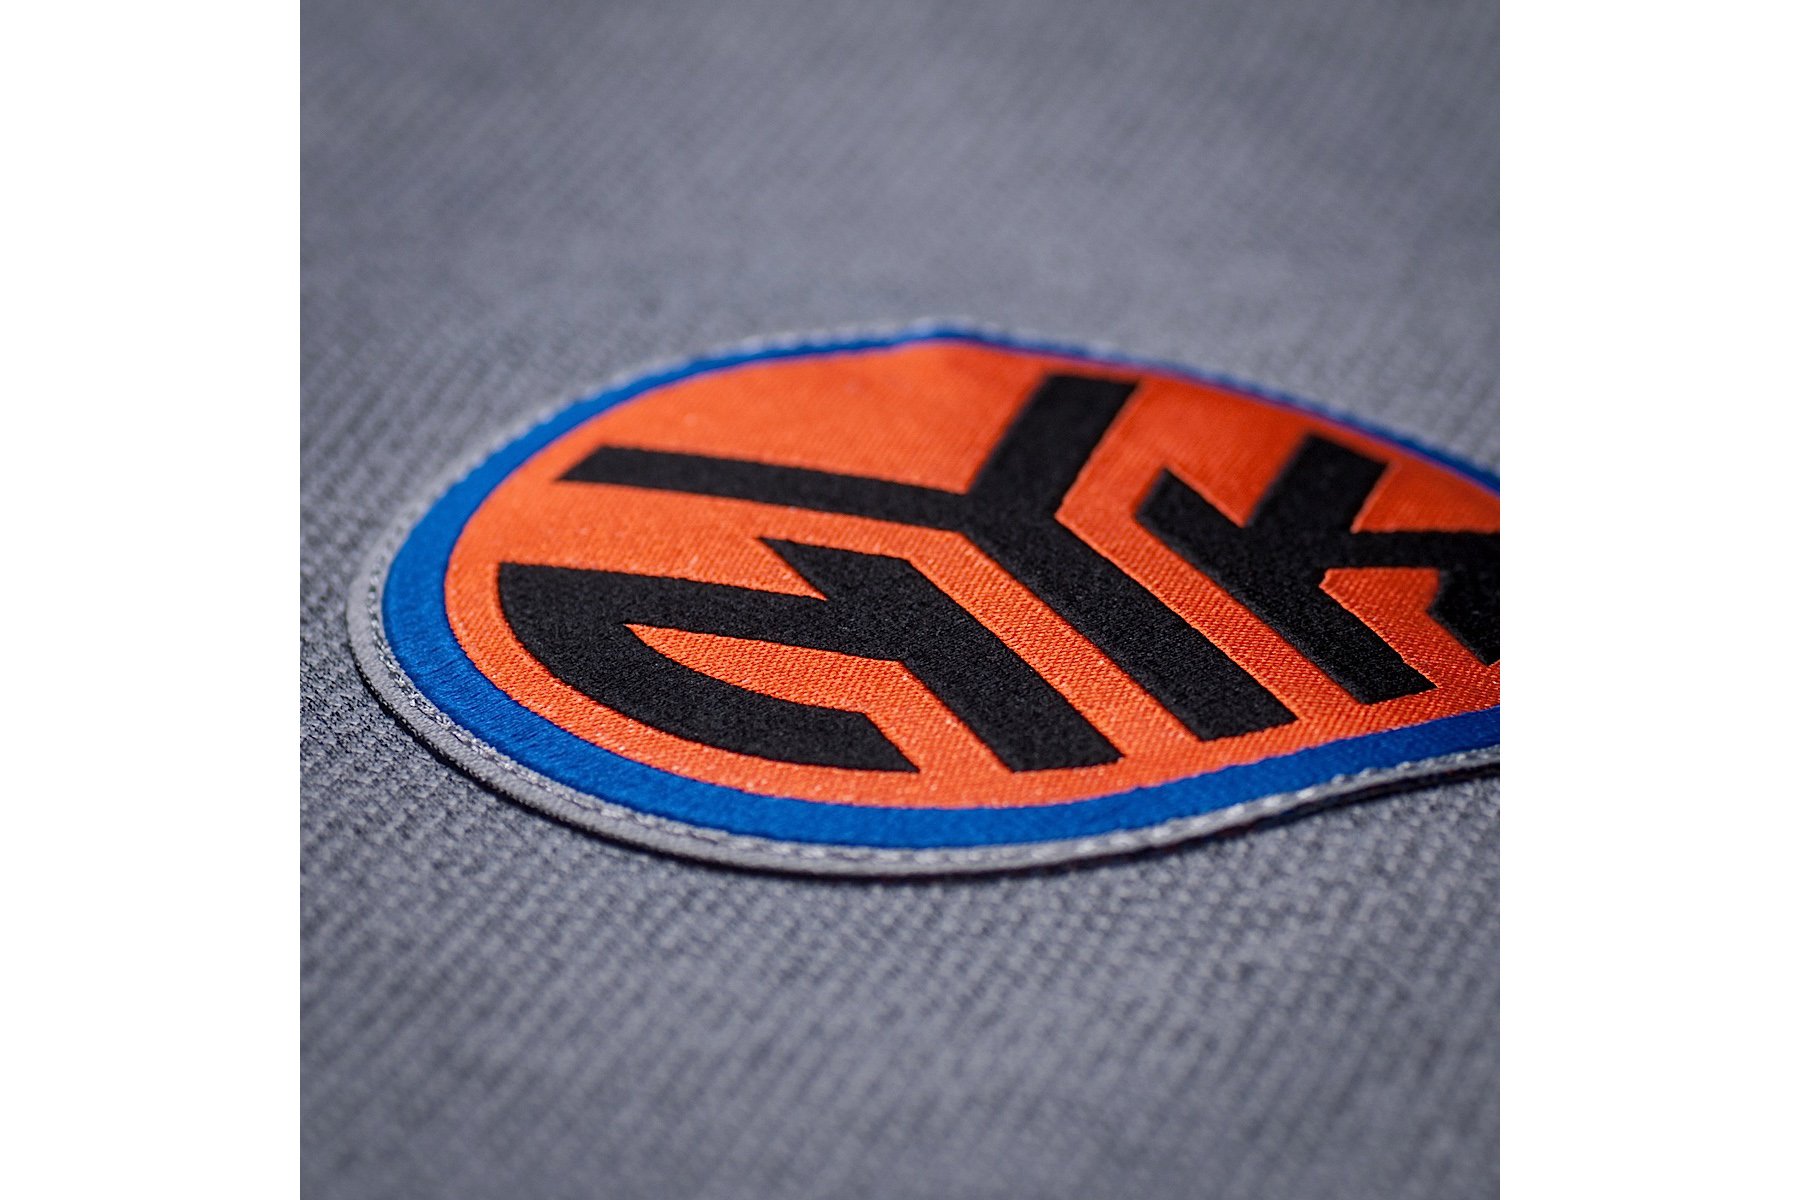 Photographe Packshot Textile